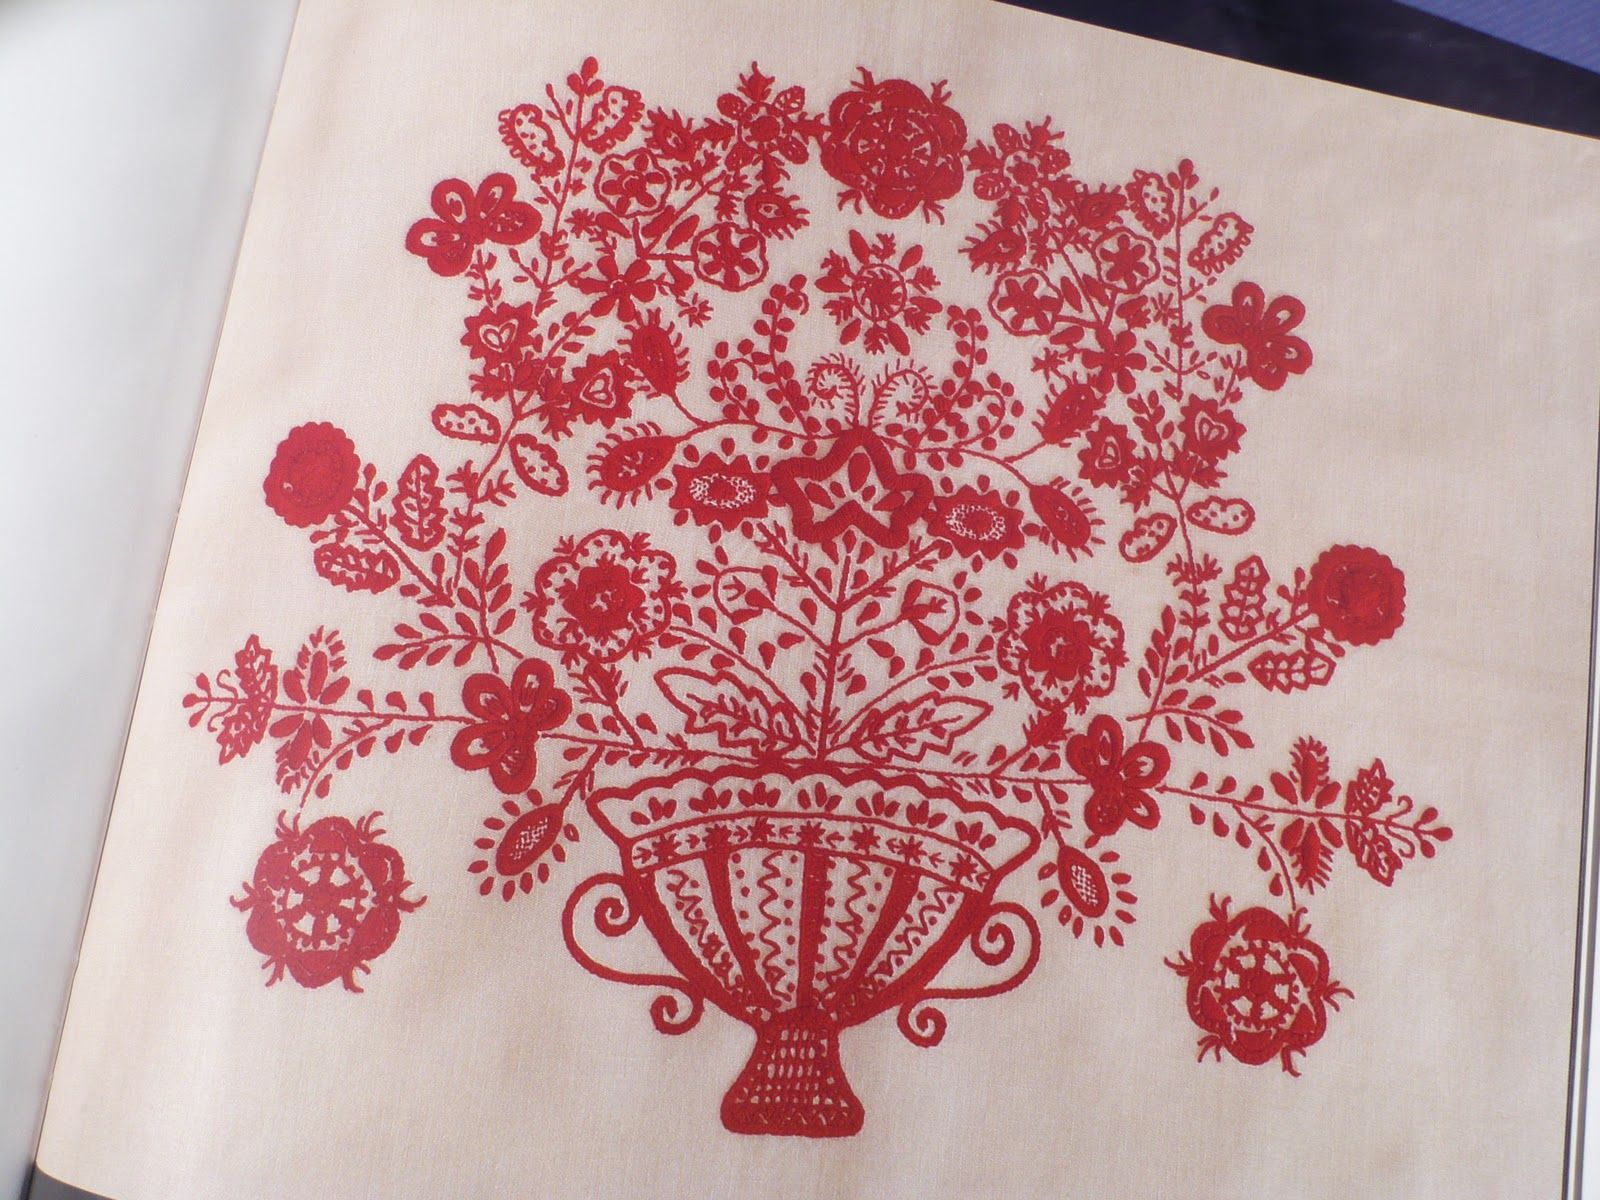 Knitting Embroidery Bordado : Portuguese embroidery patterns bordado de